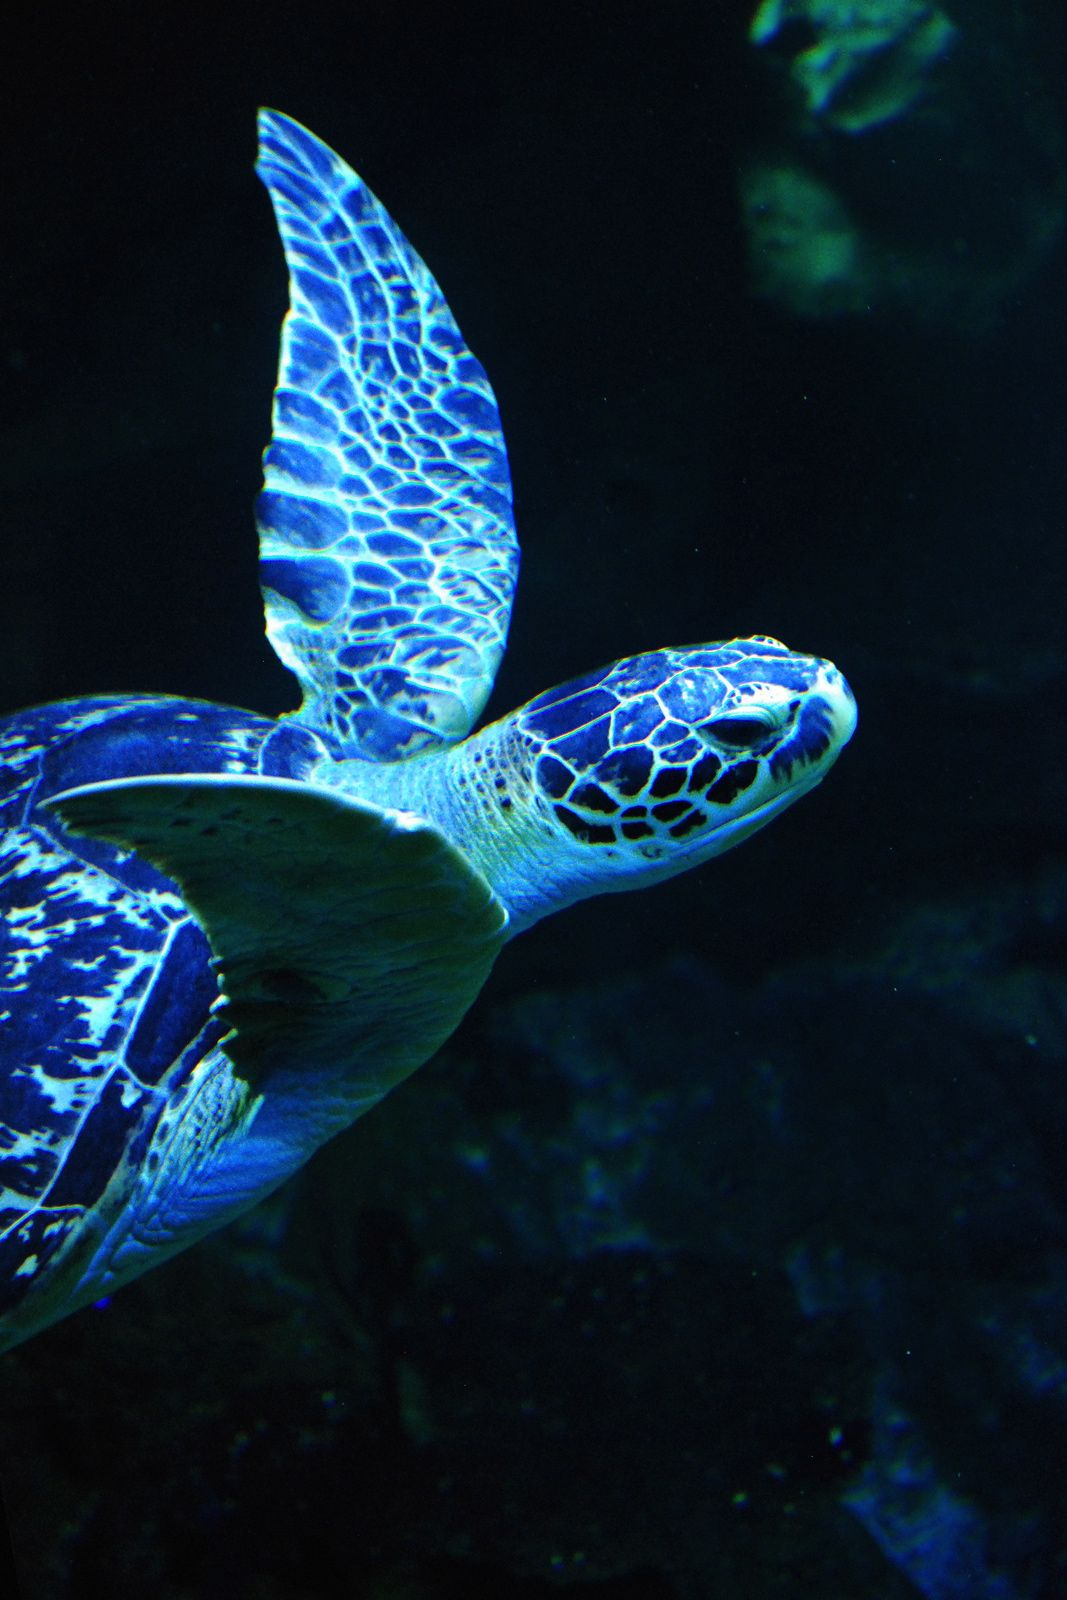 Blue baby turtles - photo#29